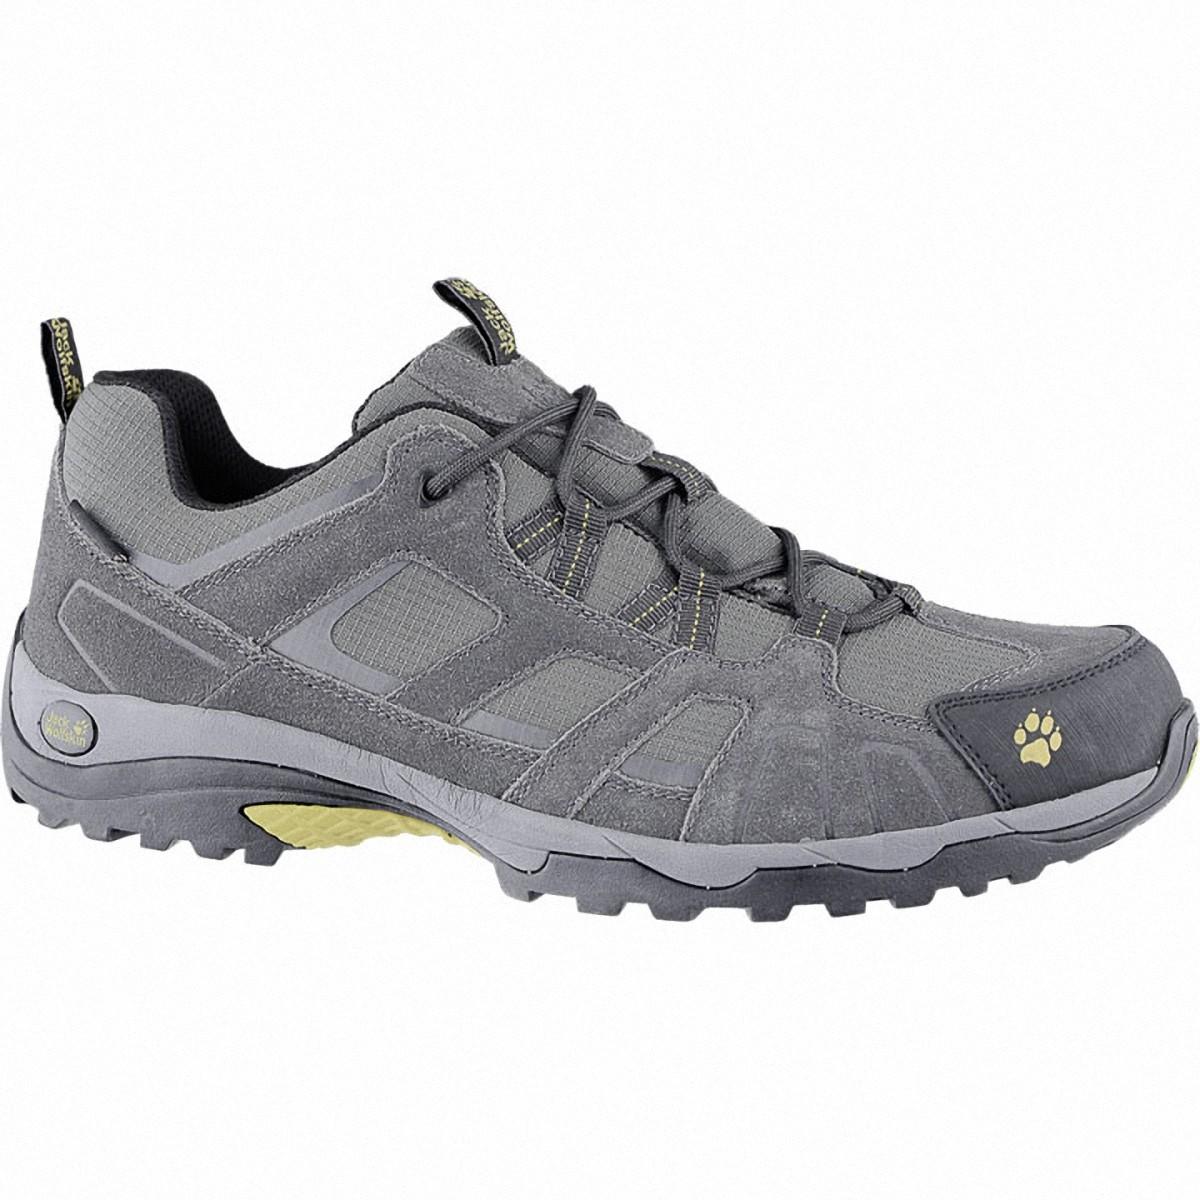 Jack Wolfskin Vojo Hike Texapore Men Herren Leder Mesh Outdoor Schuhe burly y